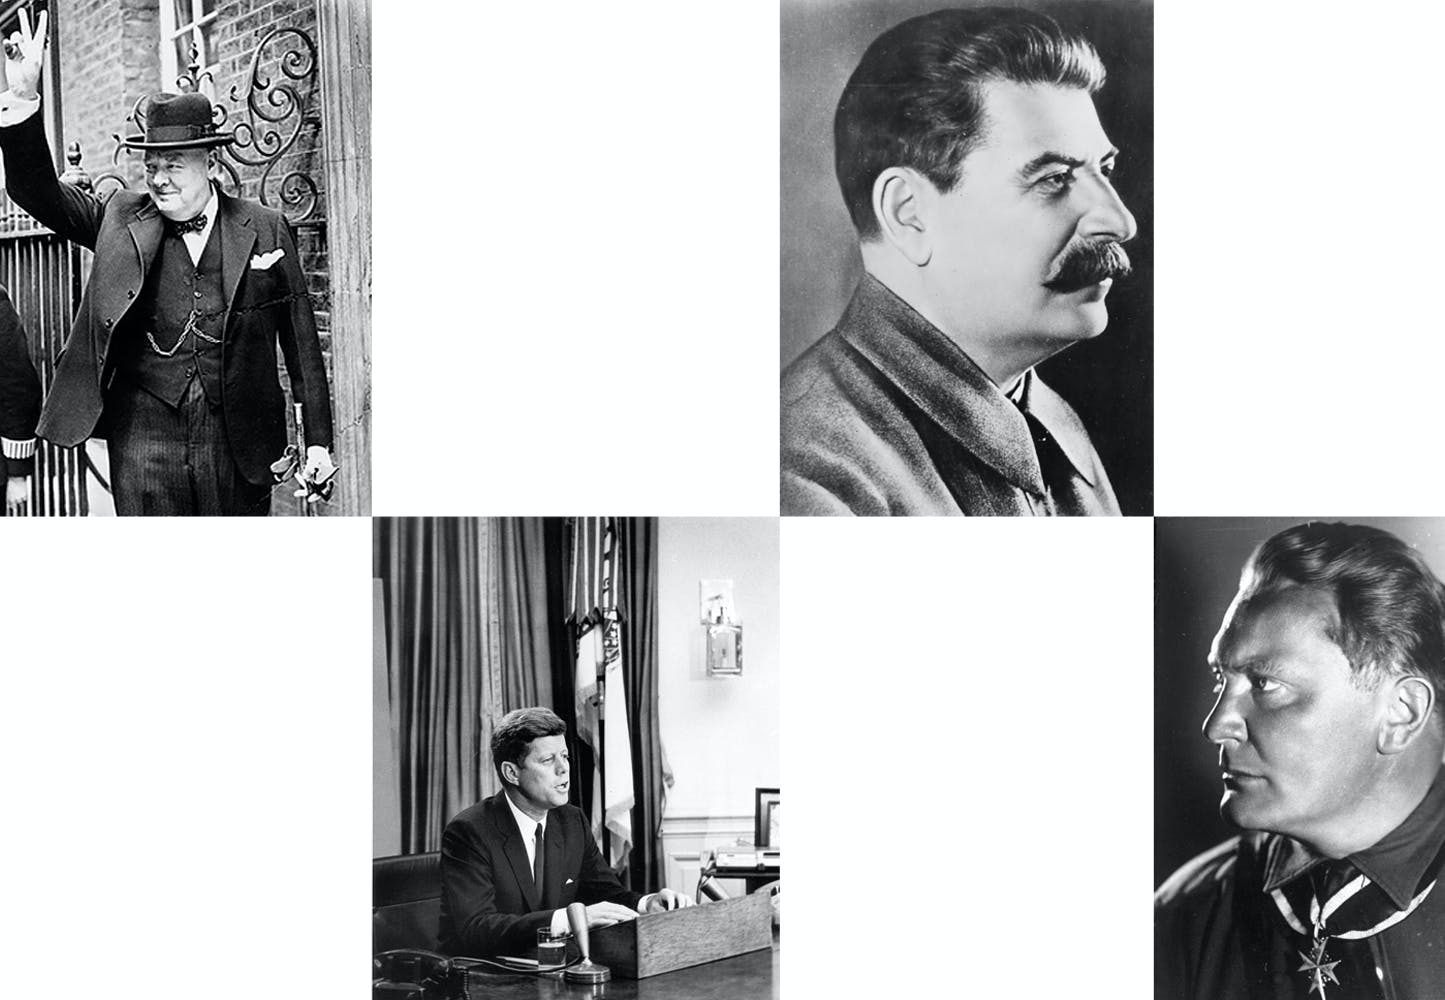 Citaten Politiek Z2 : Staalharde feiten over stalin historianet